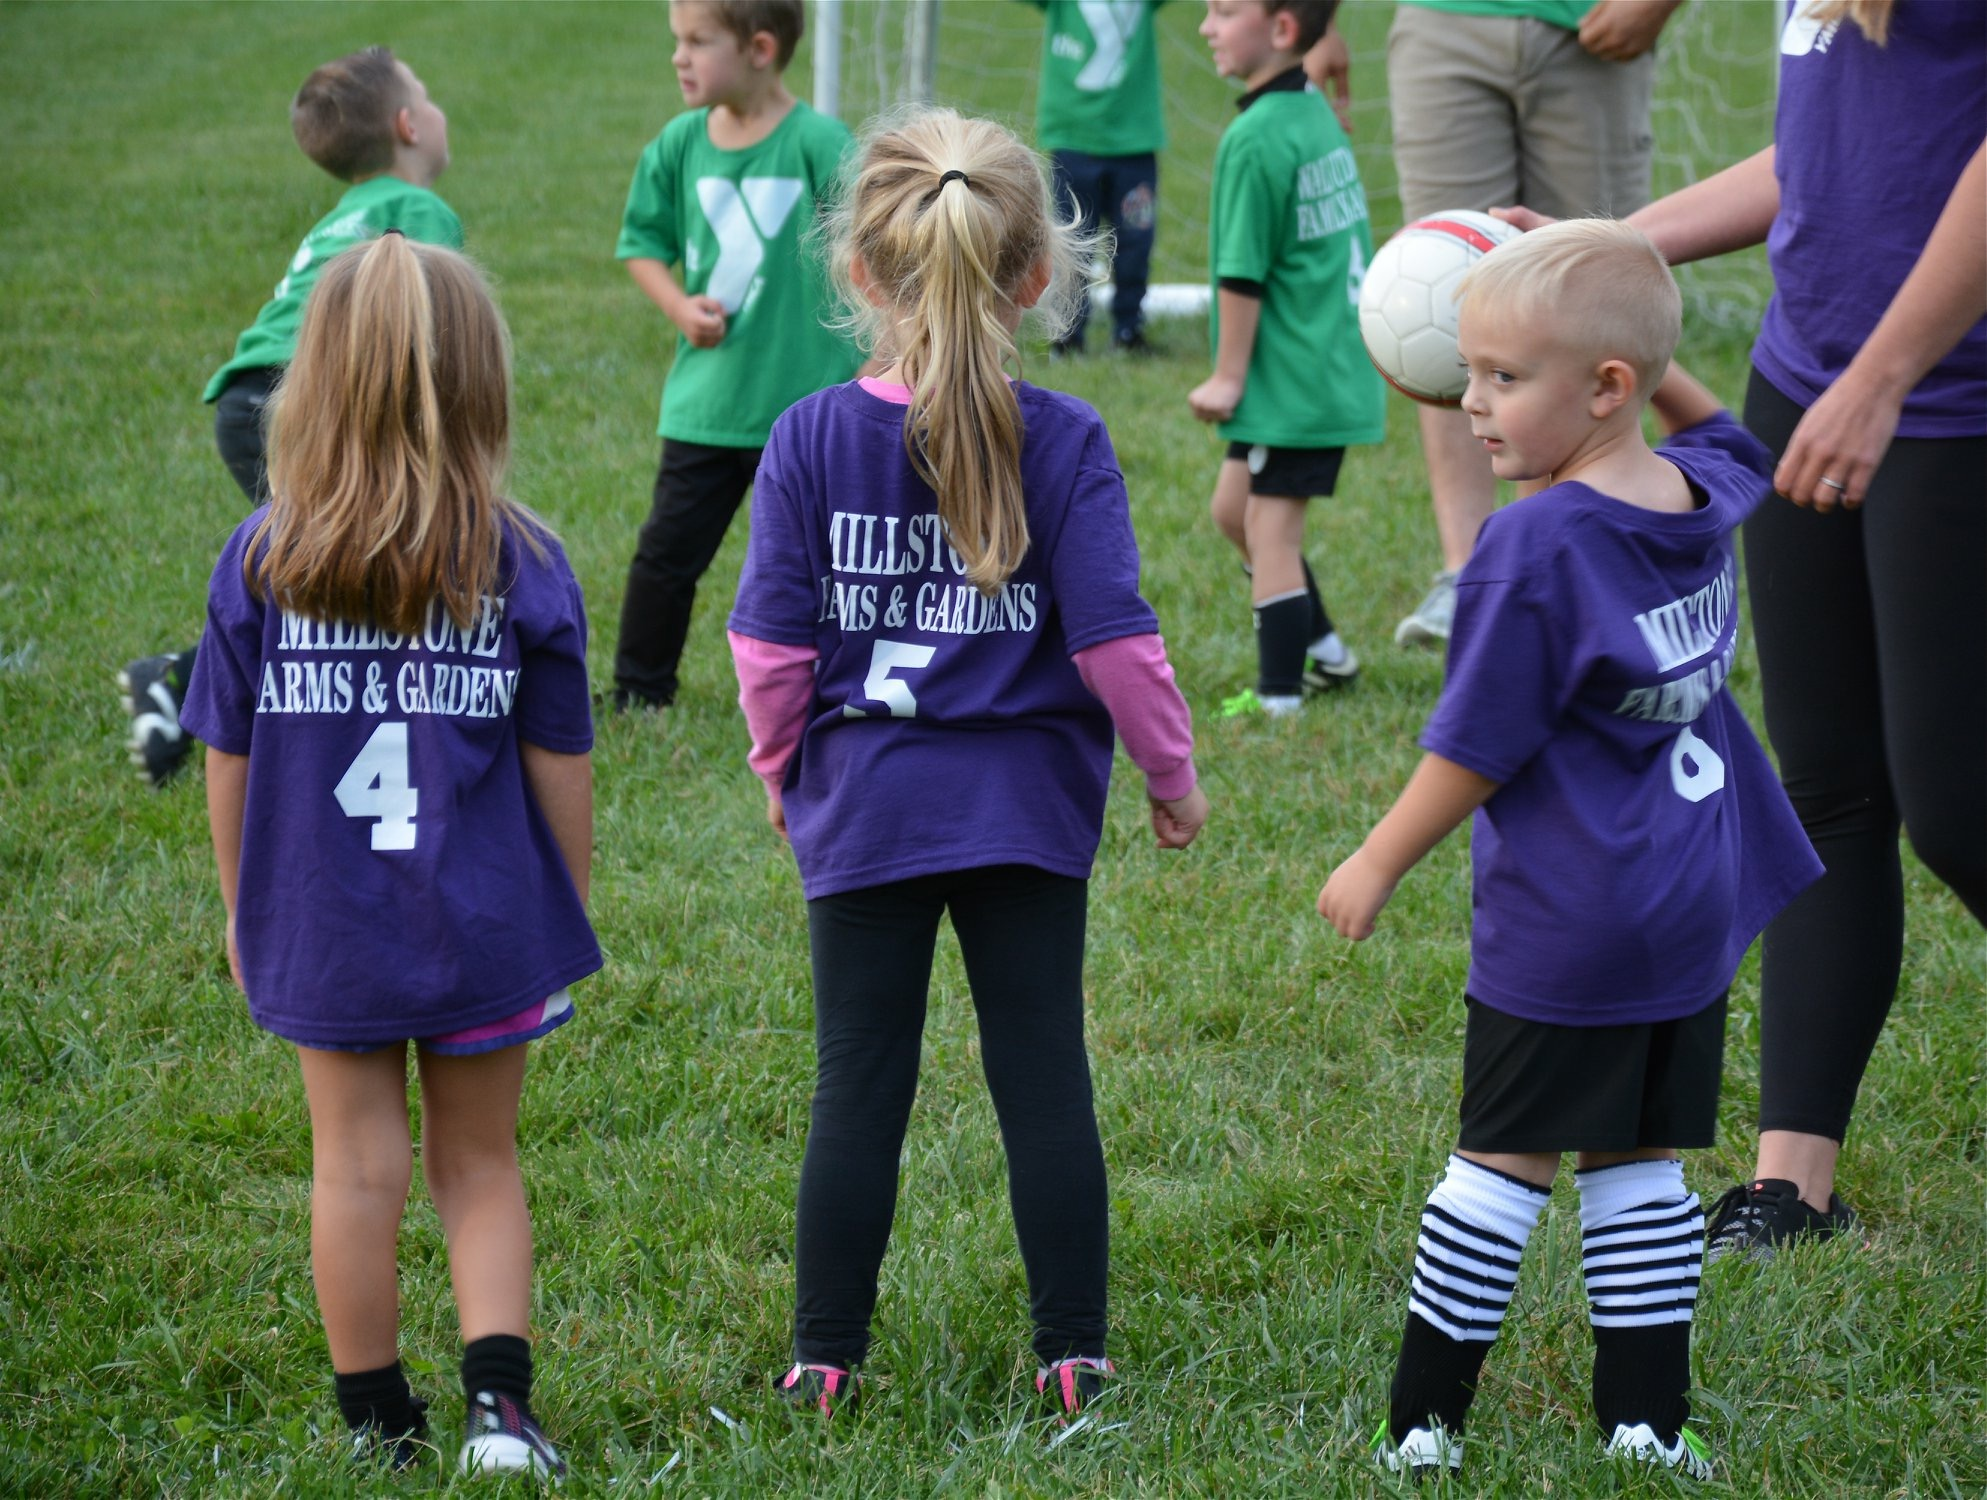 Kids enjoying youth soccer